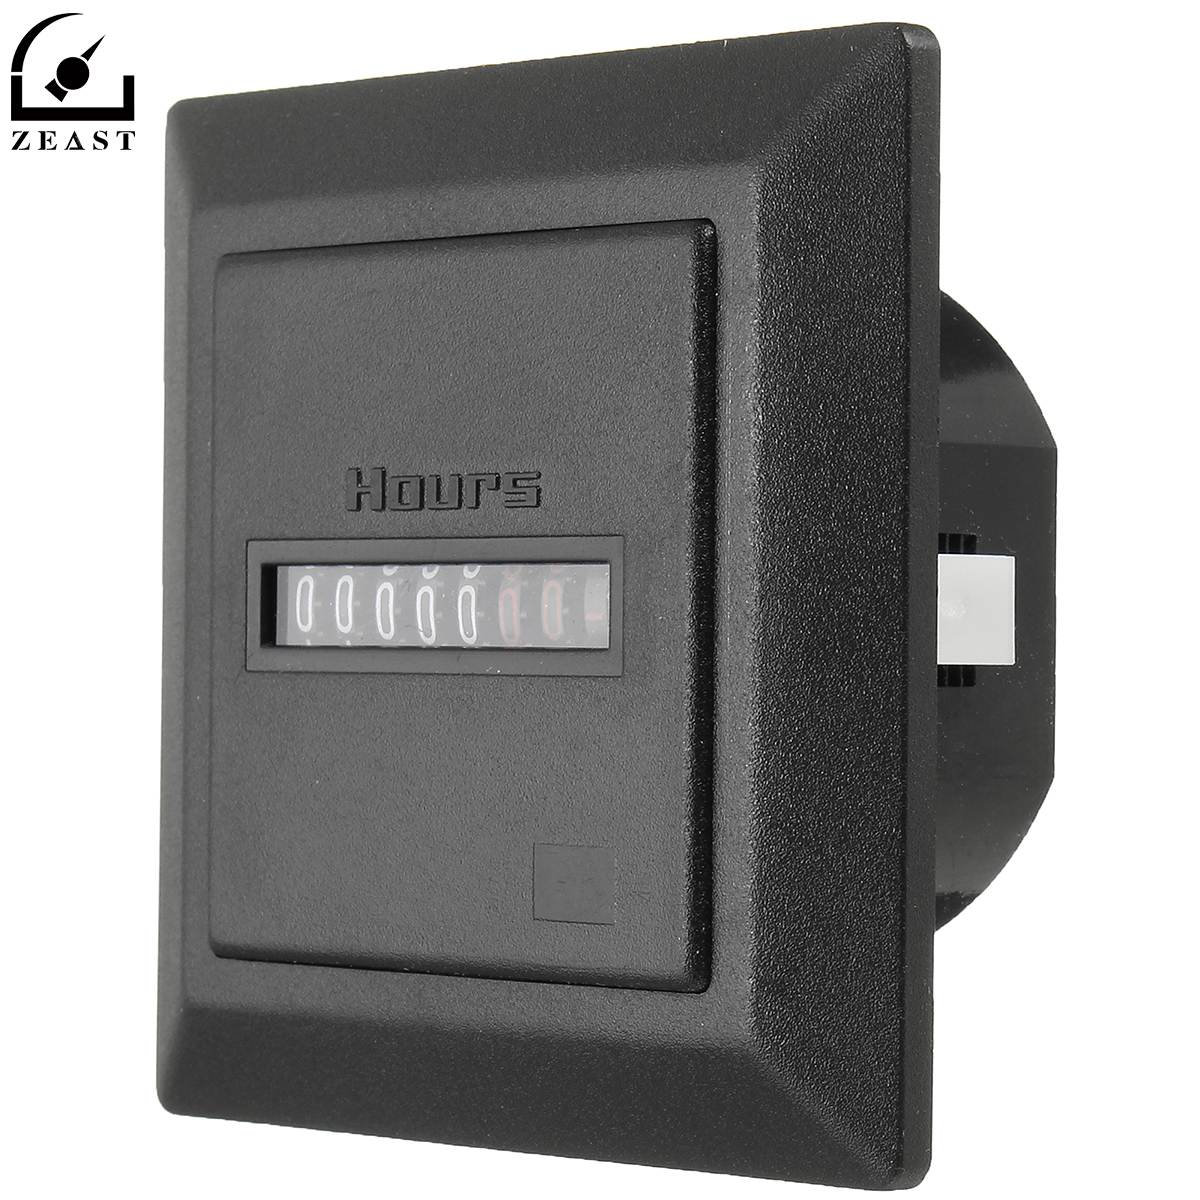 все цены на Timer Square Counter Digital 0-99999.9 Hour Meter Hourmeter Gauge AC220-240V онлайн